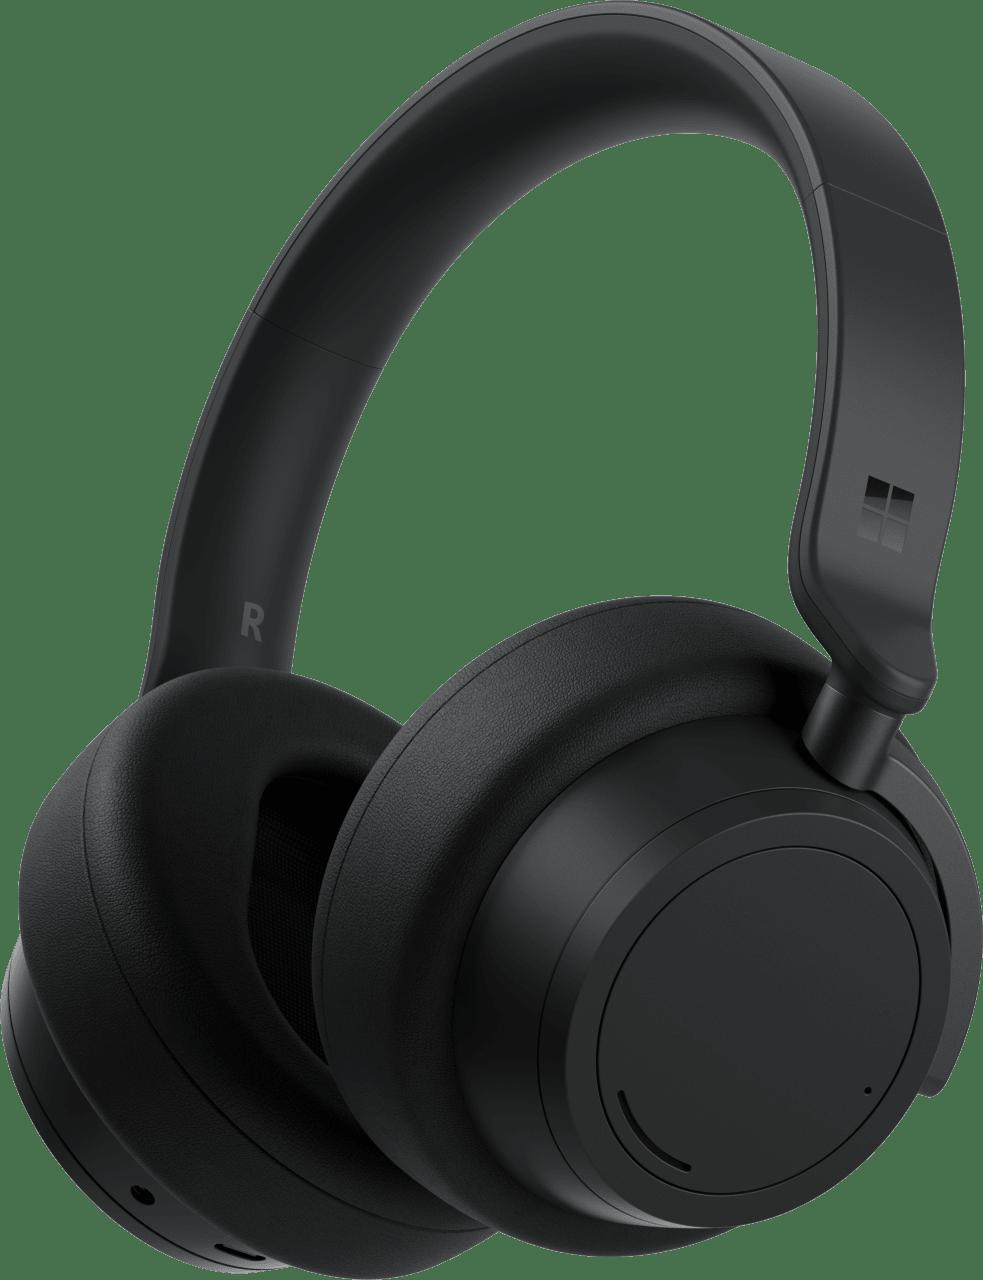 Black Microsoft Surface 2 Over-ear Bluetooth Headphones.1